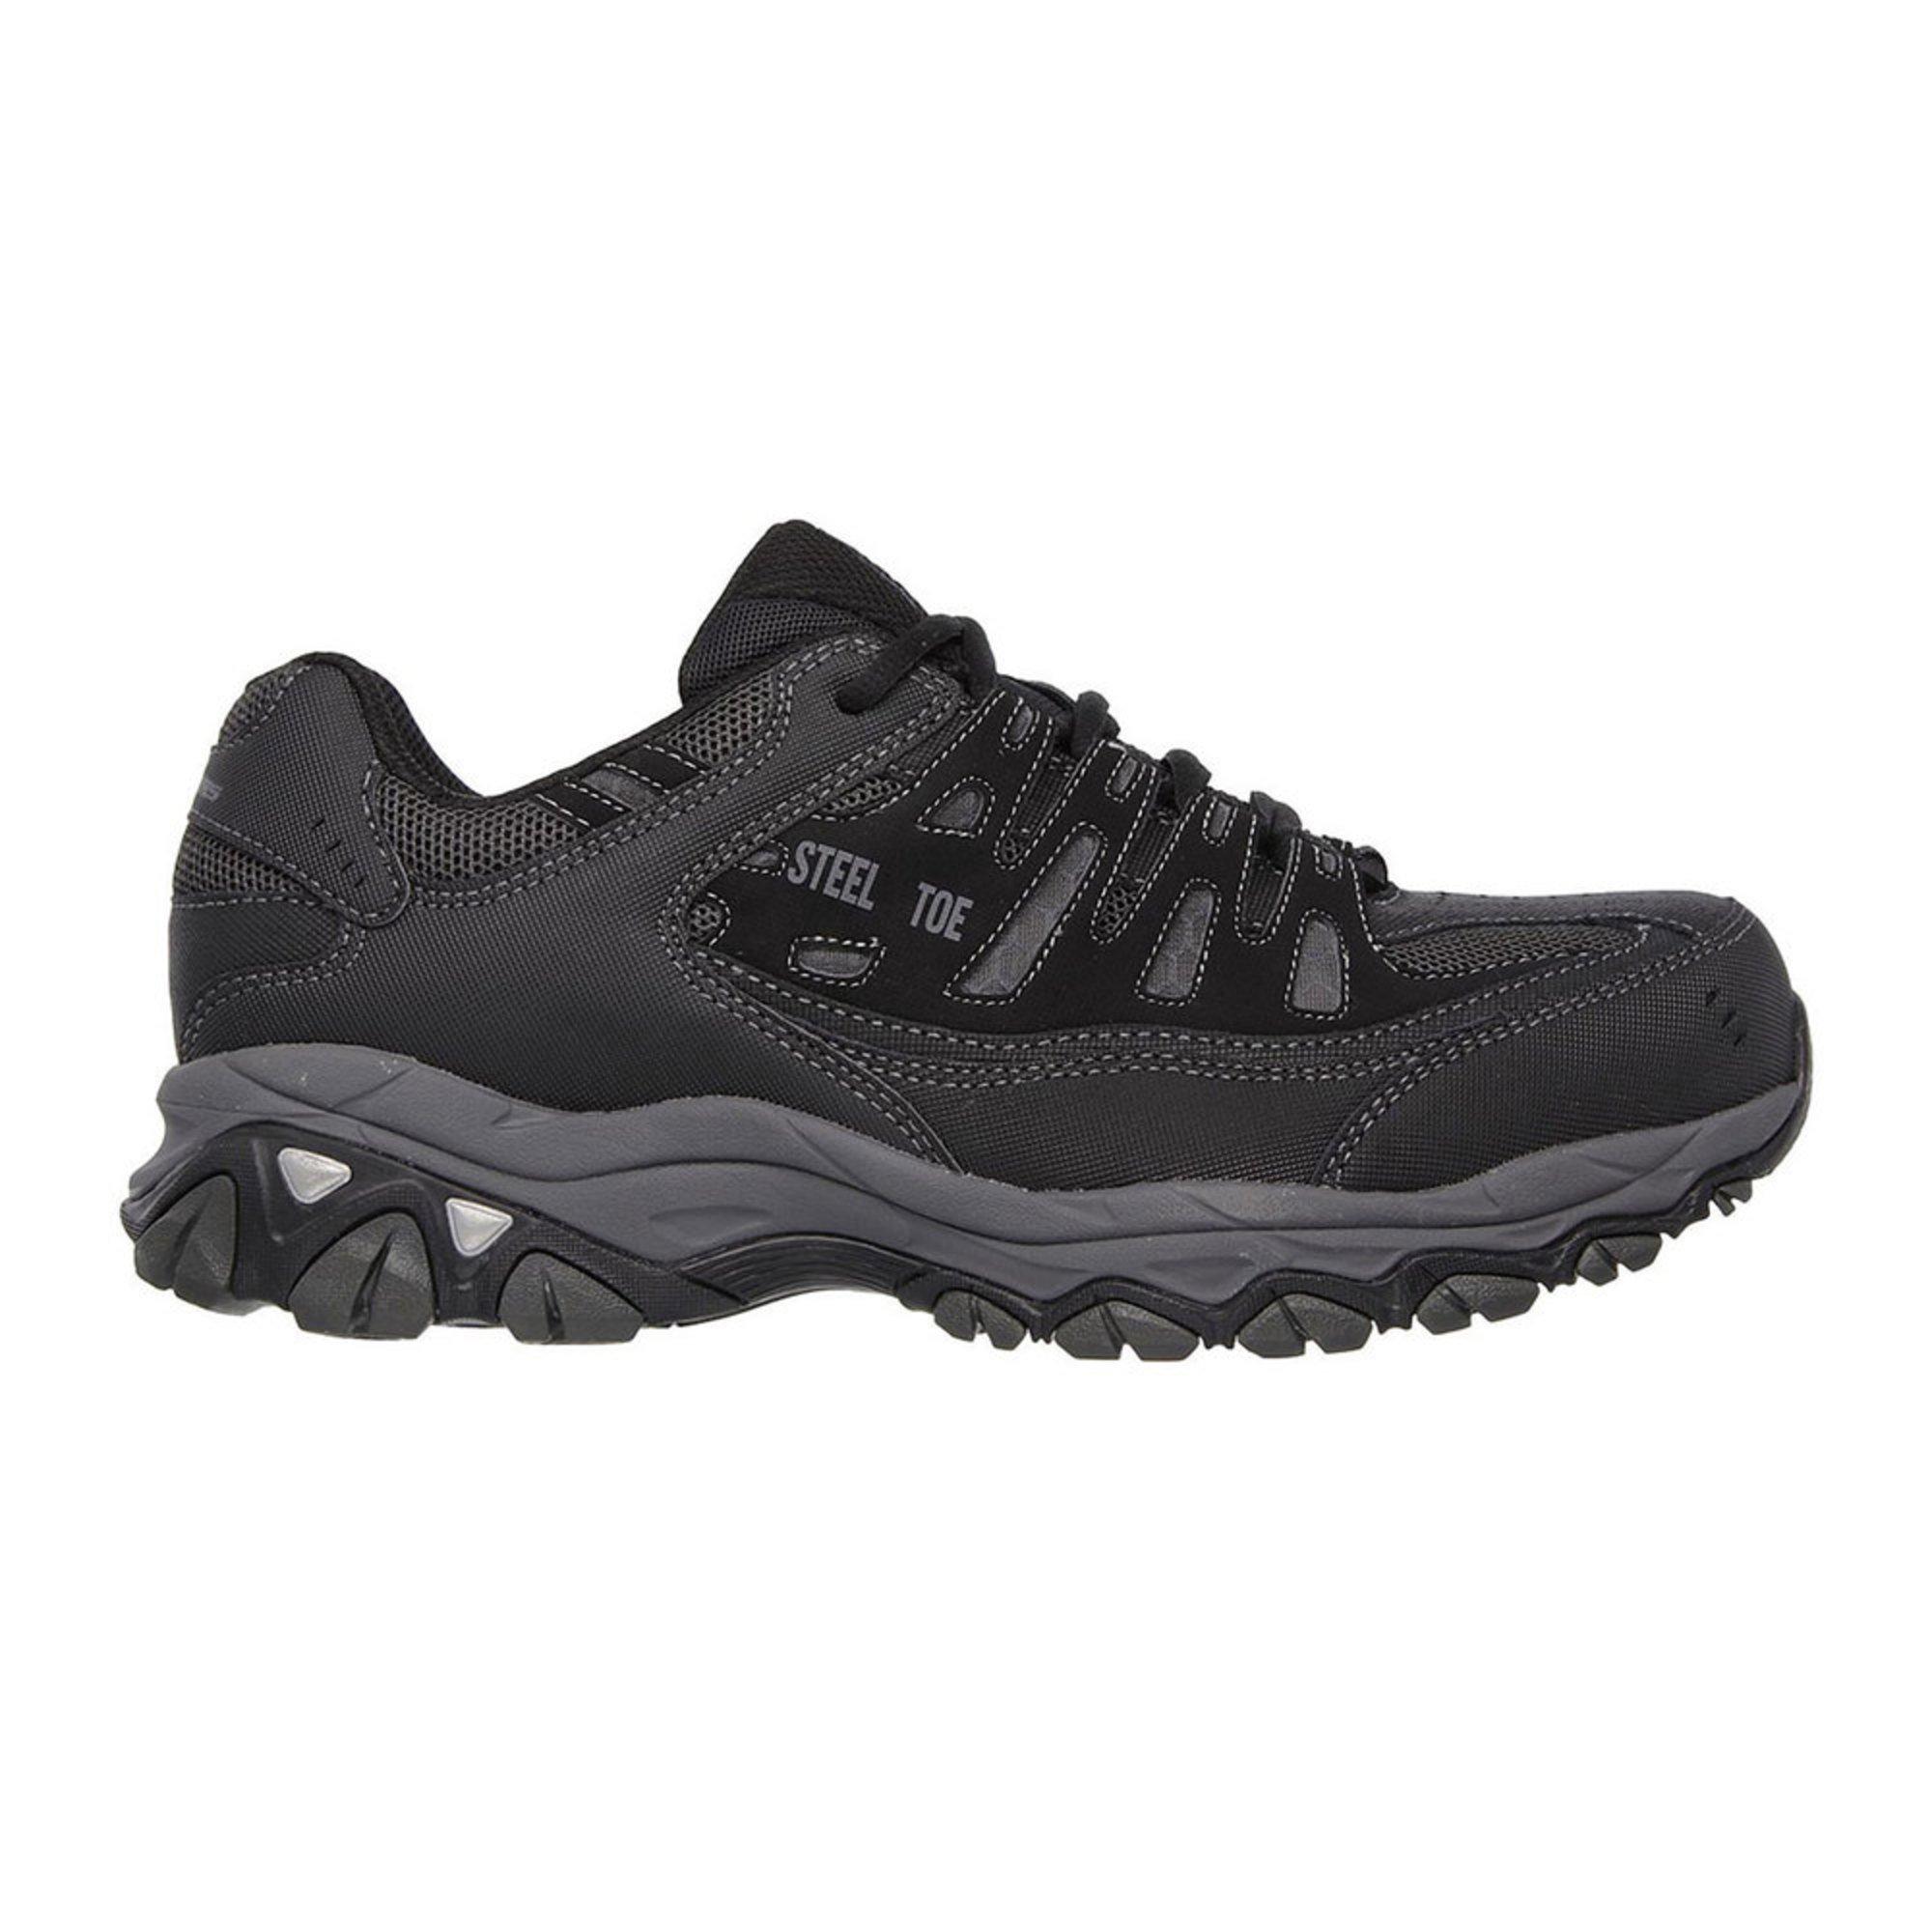 arriving good service 100% genuine Skechers Men's Crankton Steel Toe Sneaker